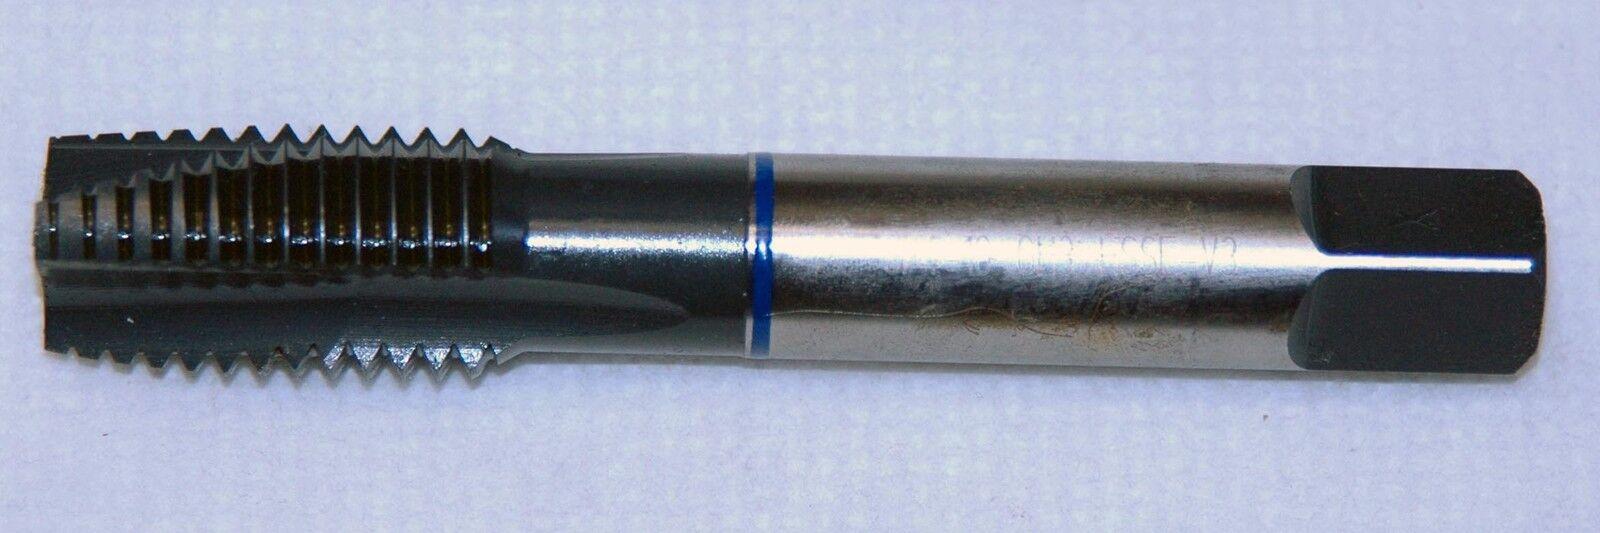 MORSE Plug Spiral Point Tap 3//4-10 H3 4FL HSS TiN 94444